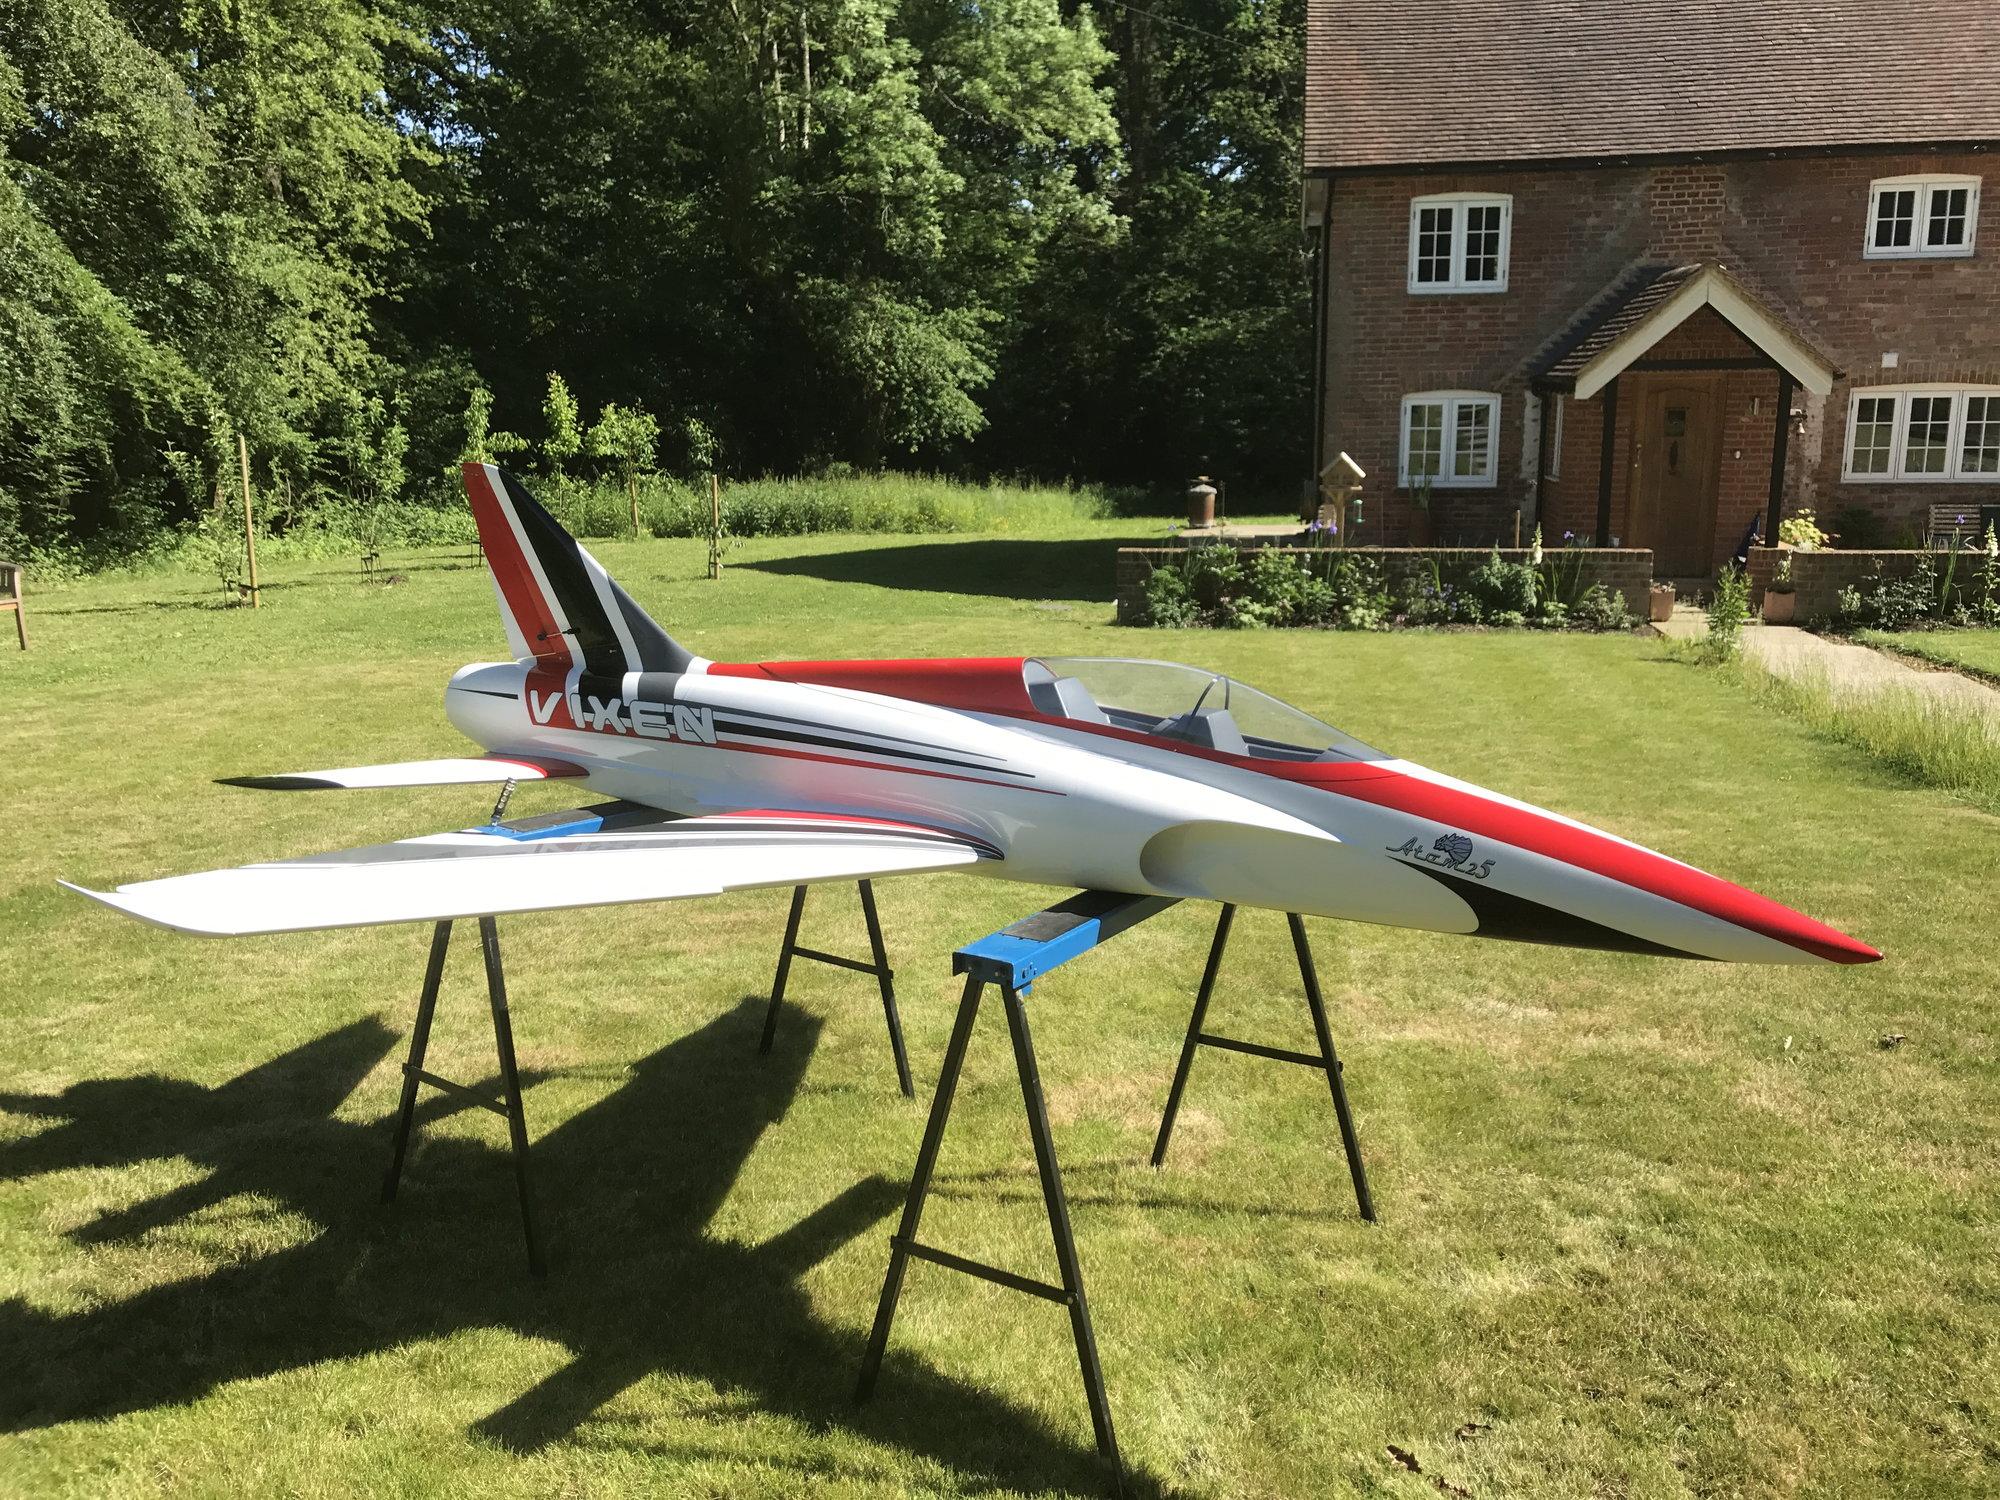 VIXEN sports jet - RCU Forums